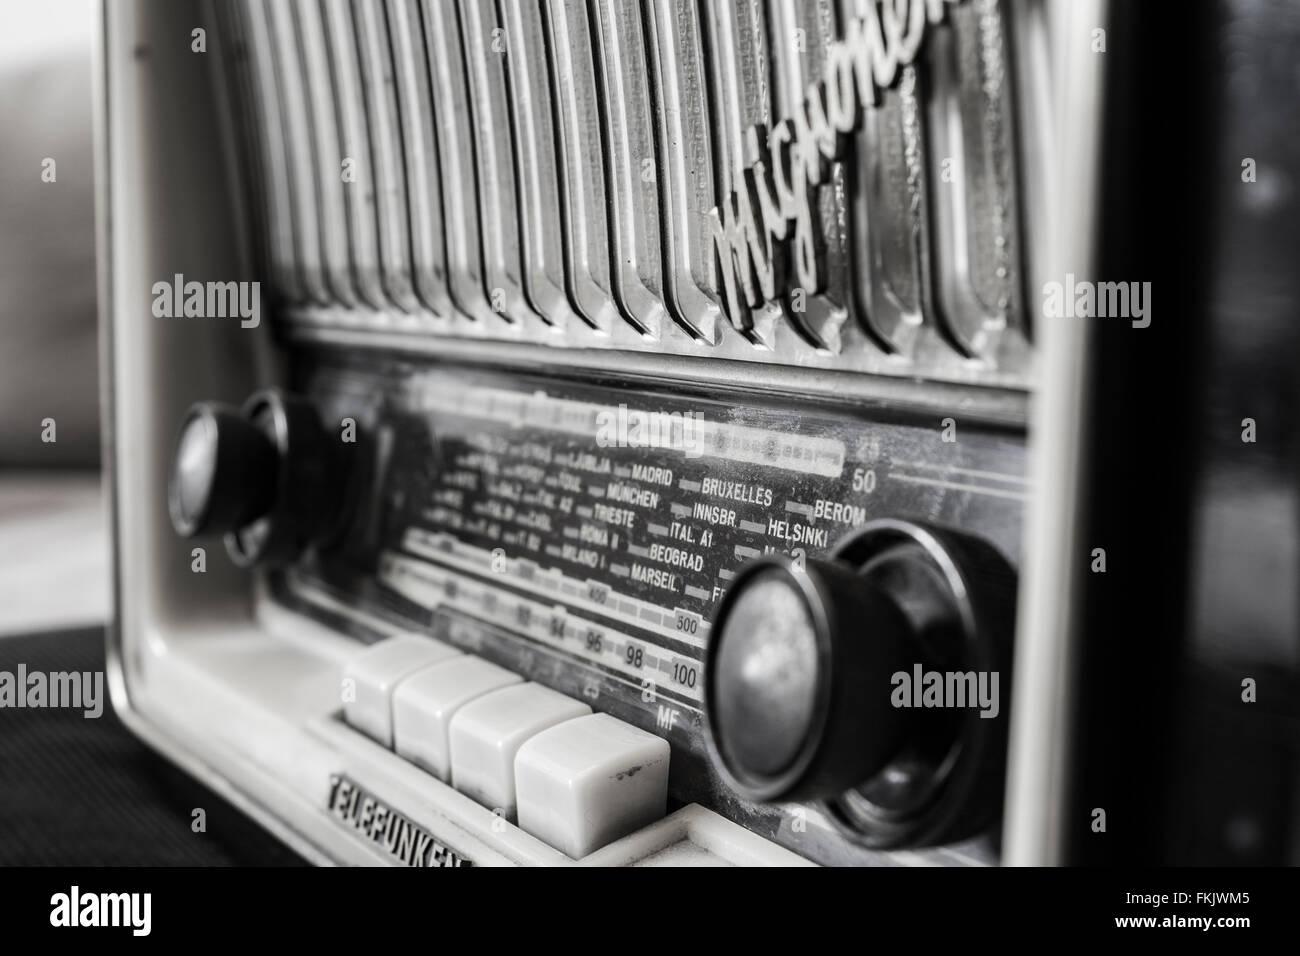 alte radio schwarz wei stockfoto bild 98145605 alamy. Black Bedroom Furniture Sets. Home Design Ideas